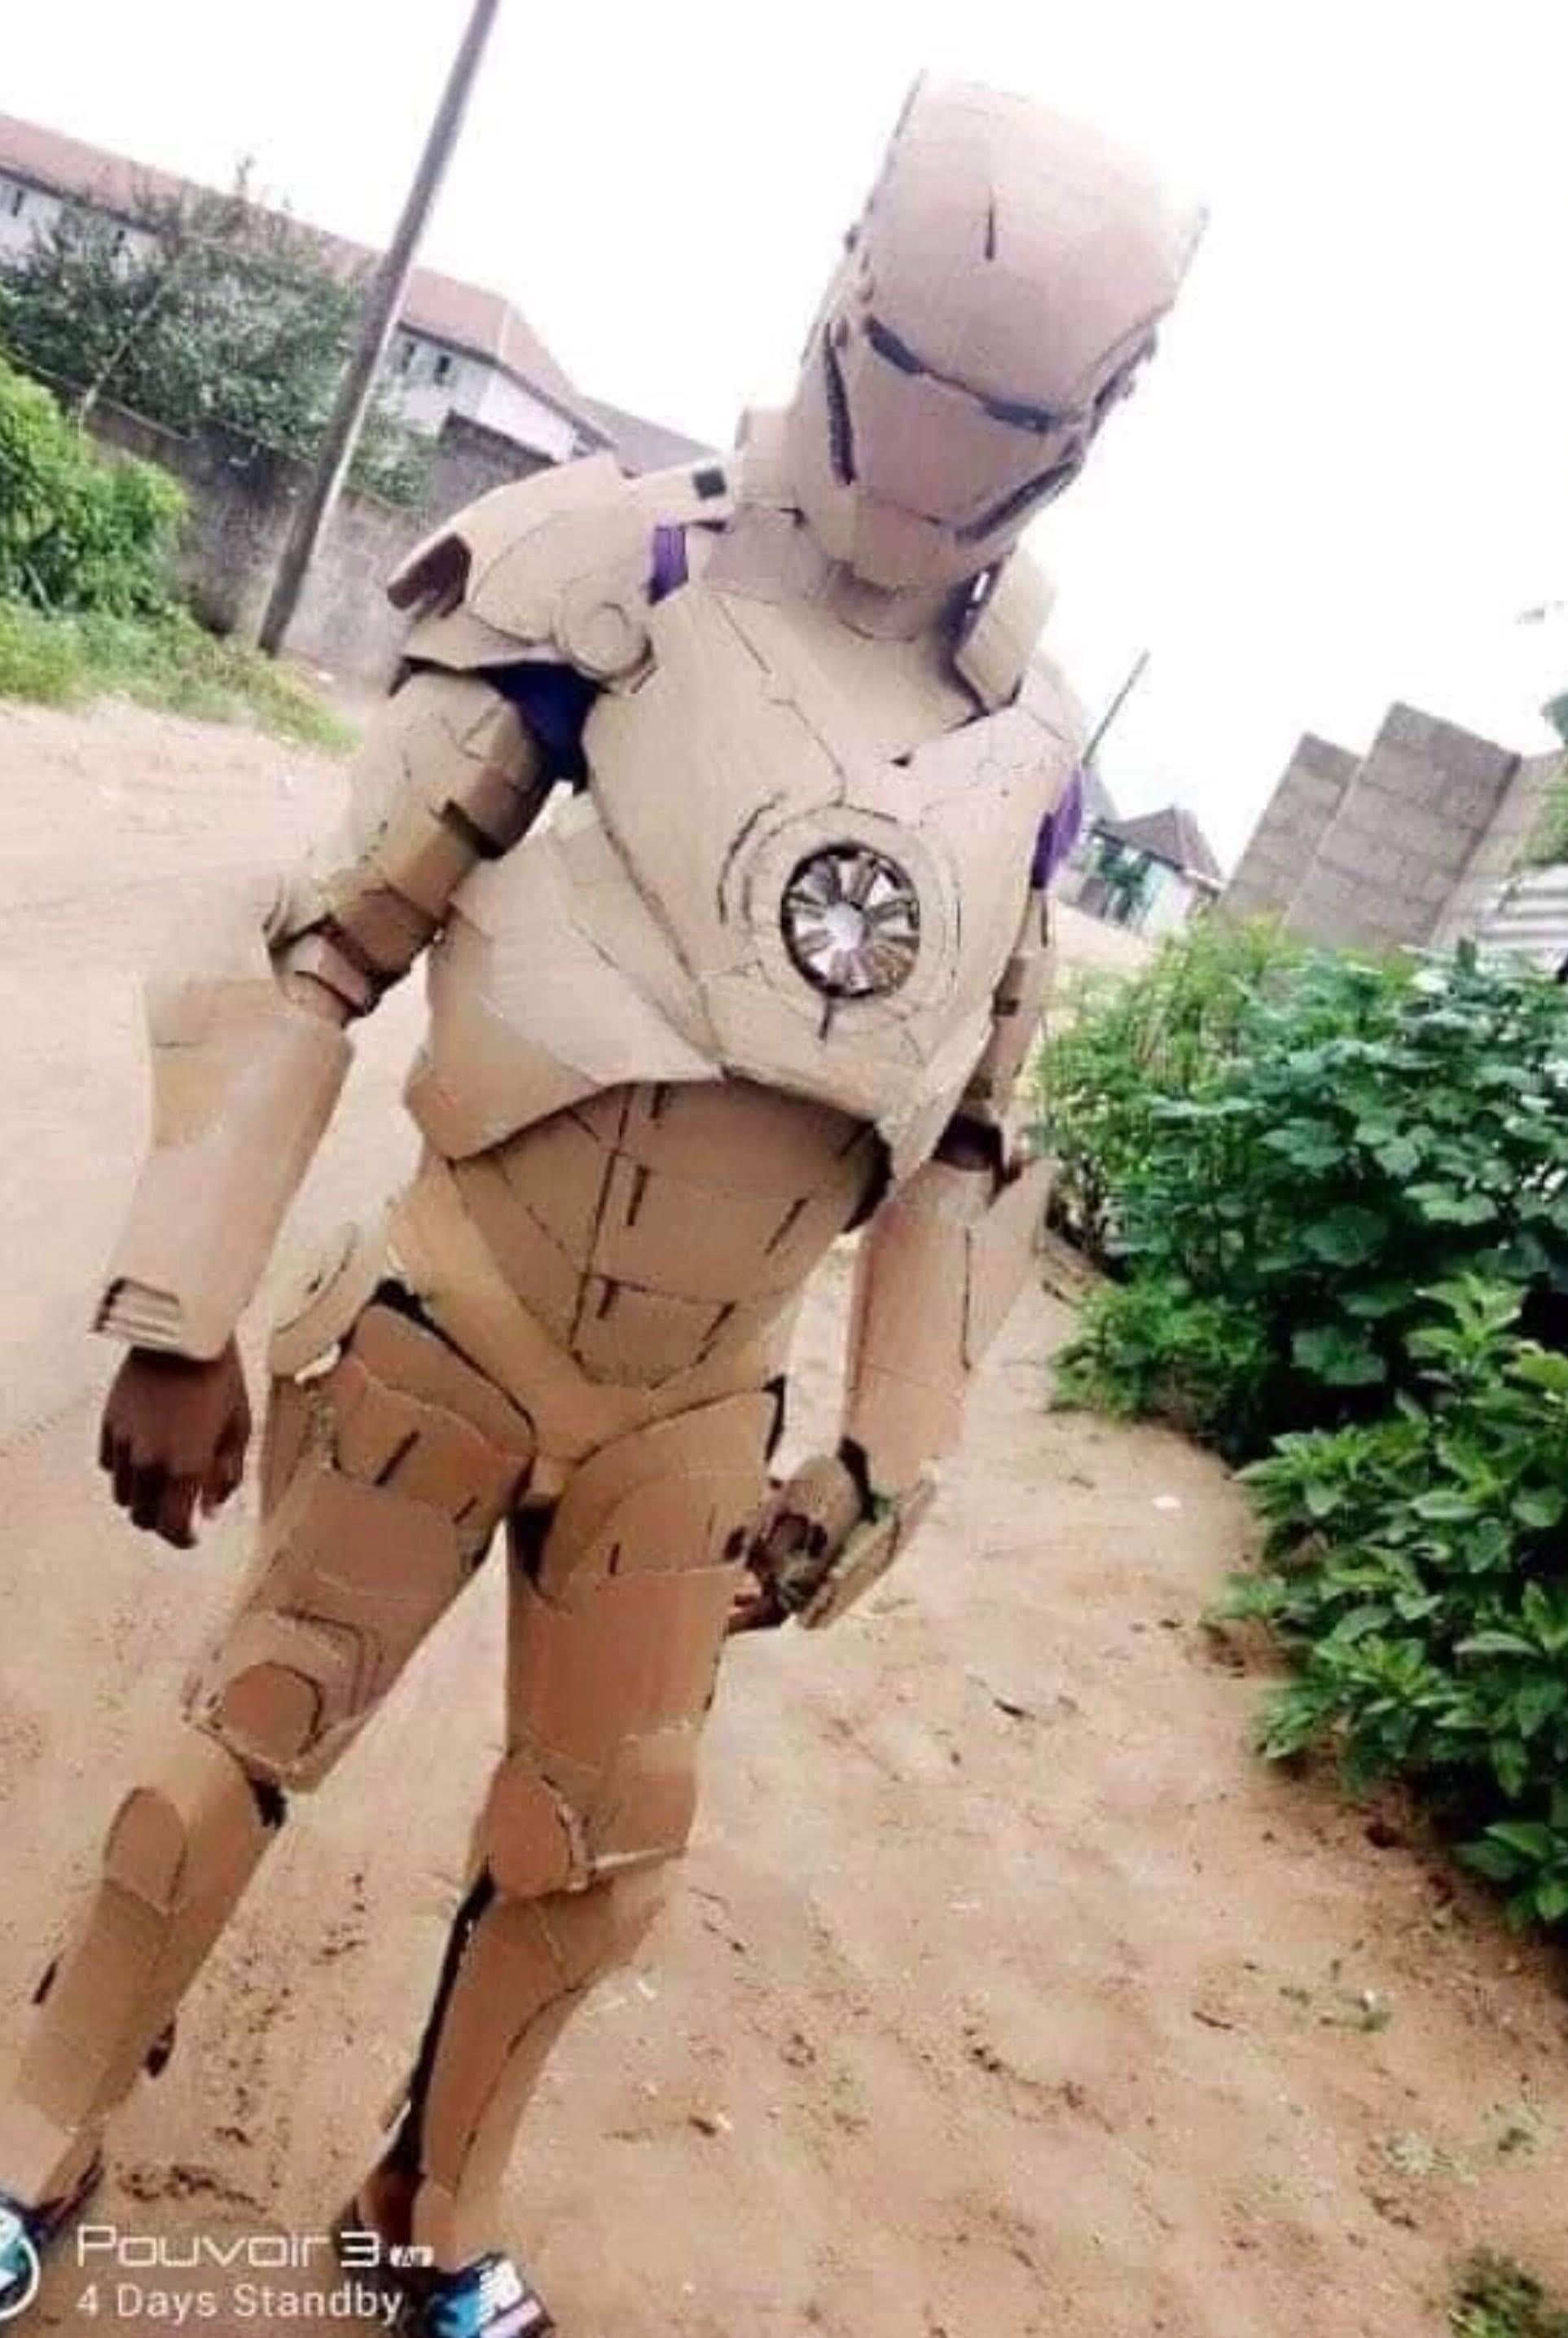 Iron Man suit made out of Cardboard : アイアンマンのお見事な手作りアーマーのマーク・ダンボール ! !